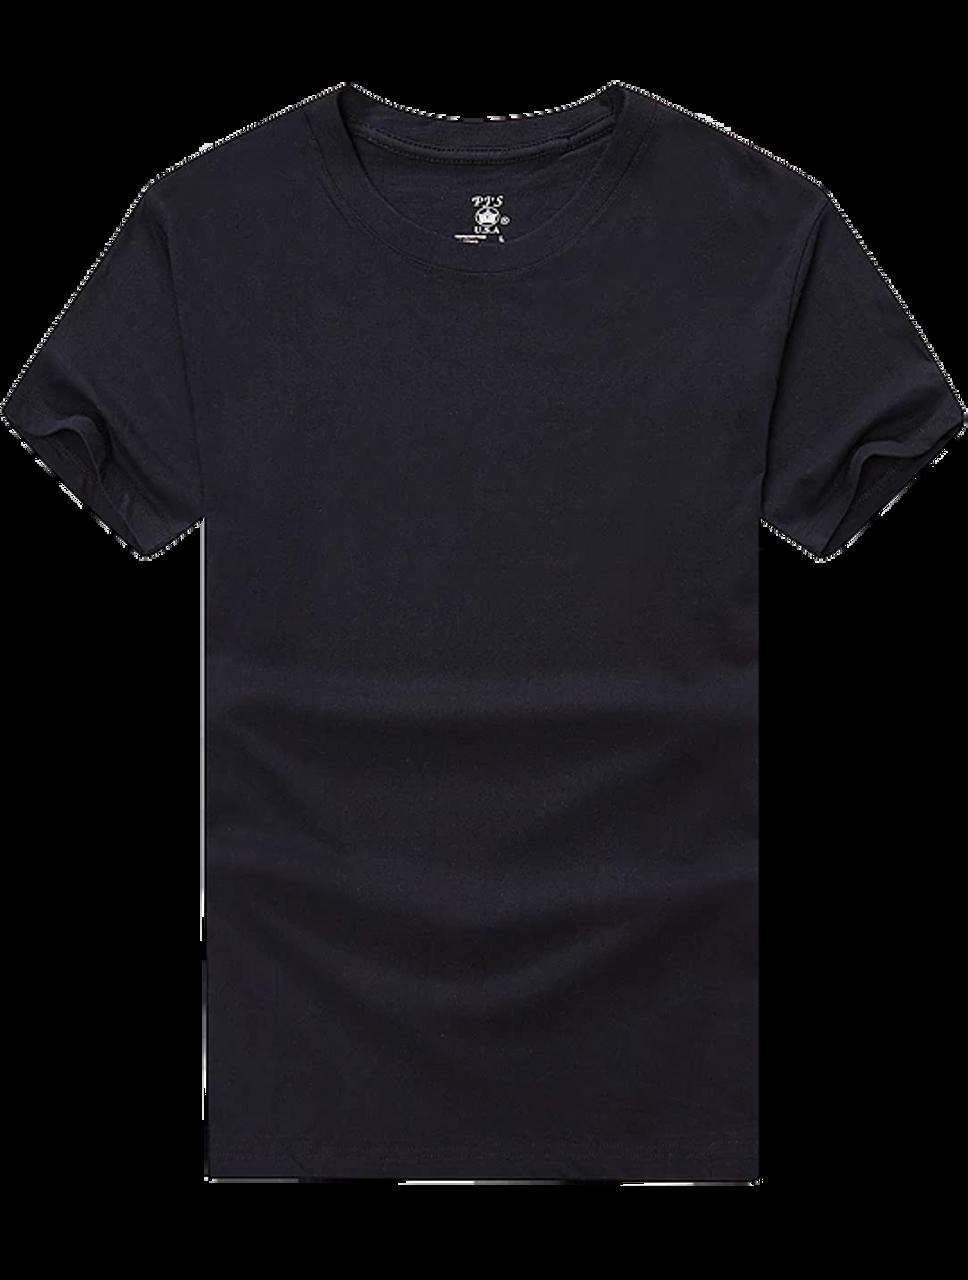 100 T-SHIRTS Blank 50 Black 50 White BULK LOT S-XL Wholesale Gildan G500 Tees